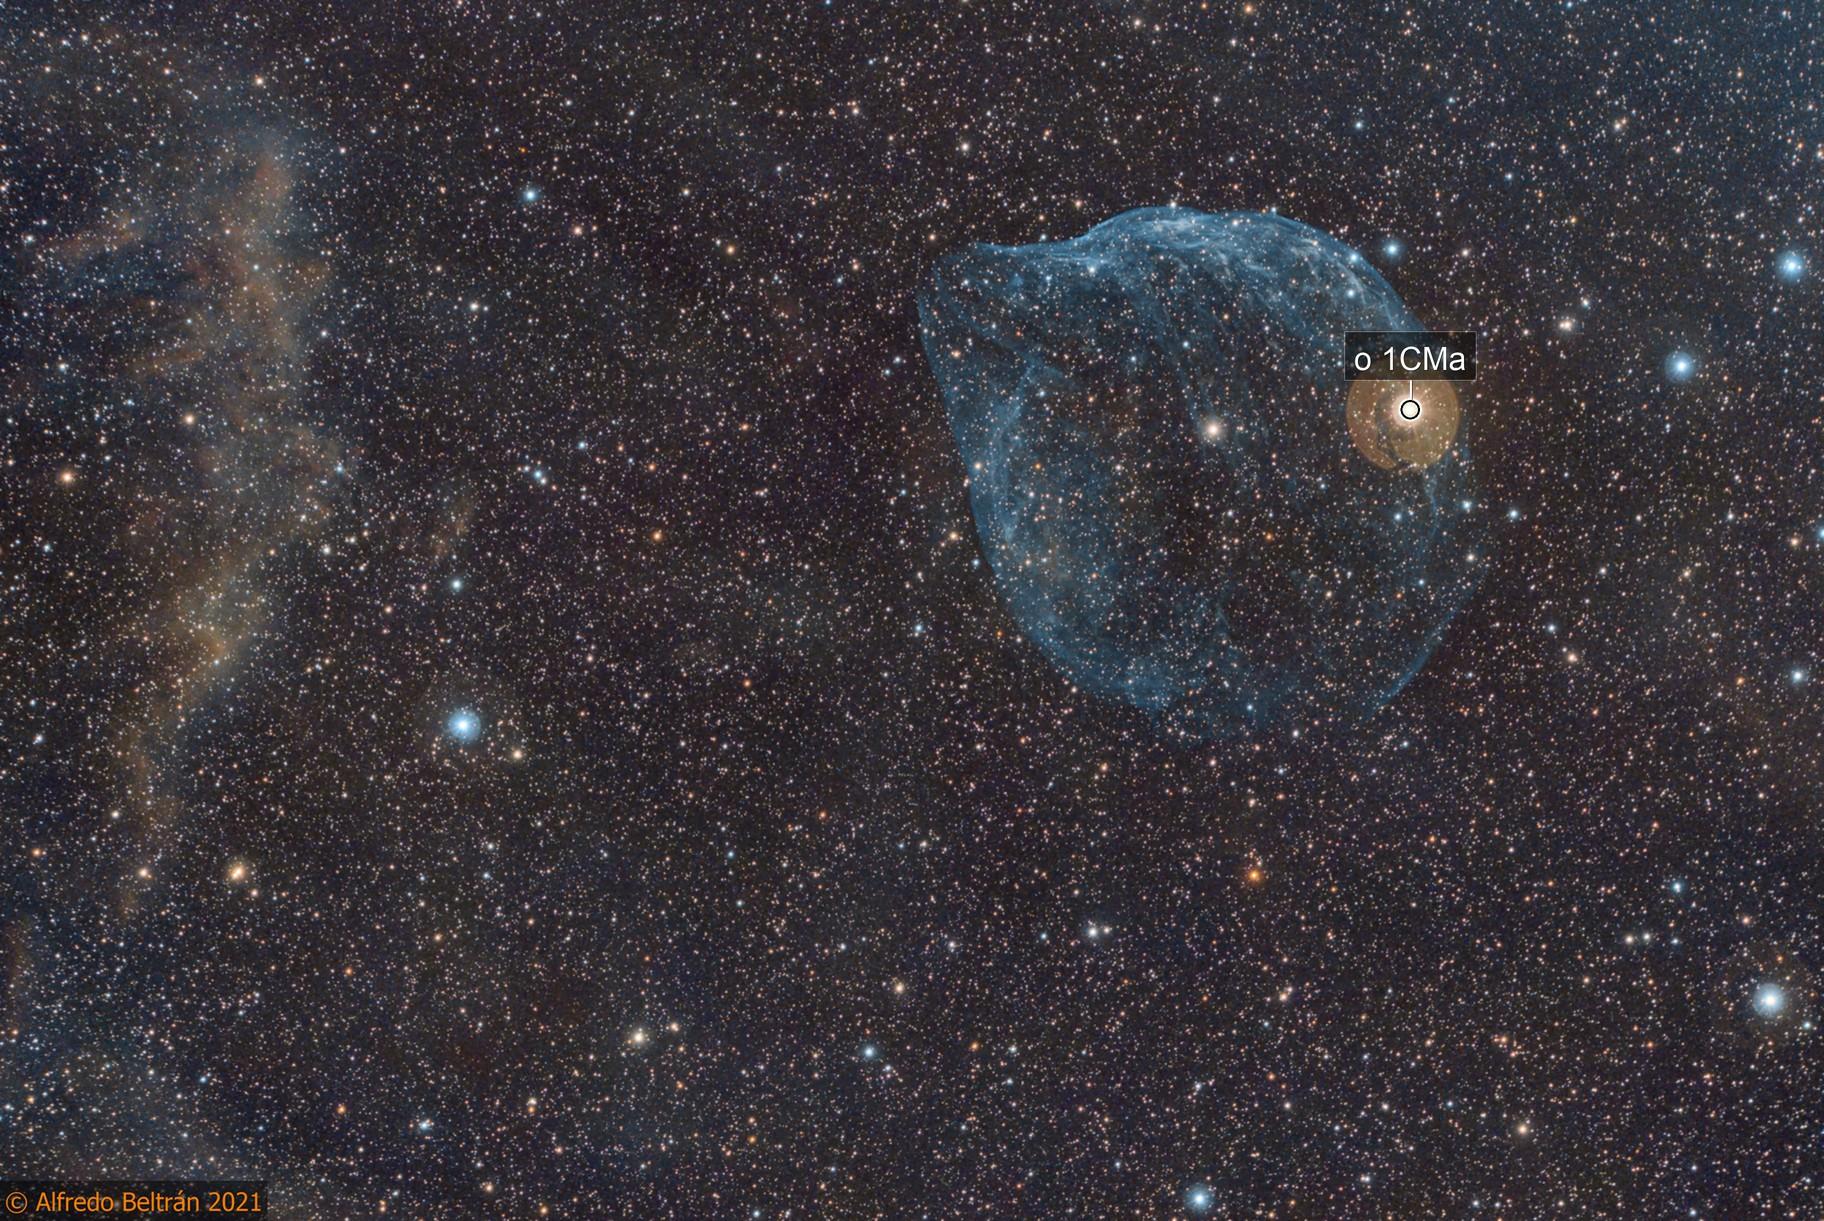 Sh2-308 Nebulosa cabeza de delfín (Dolphin head nebula)